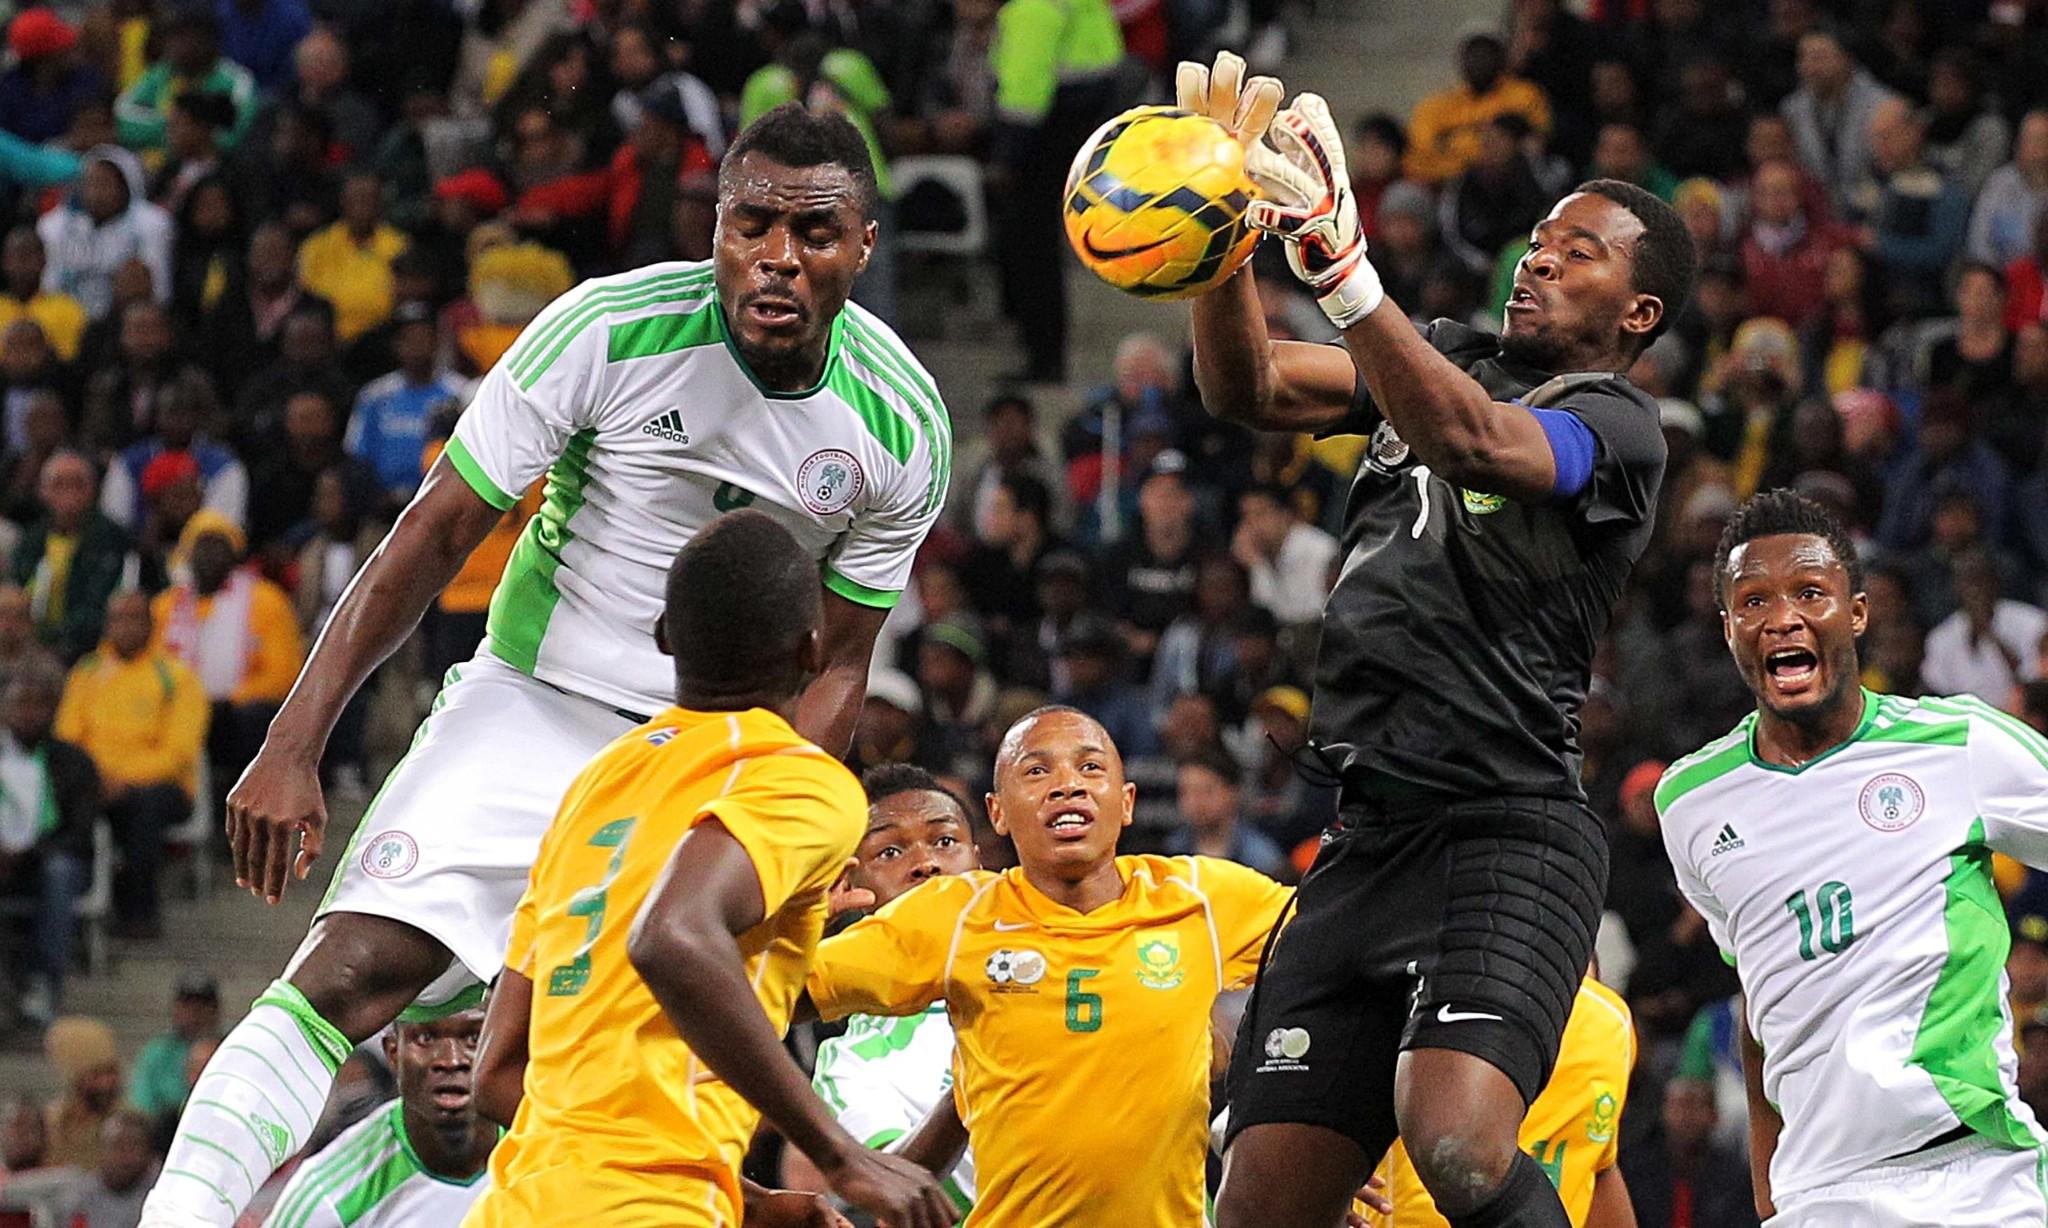 South Africa's international goalkeeper Senzo Meyiwa shot dead